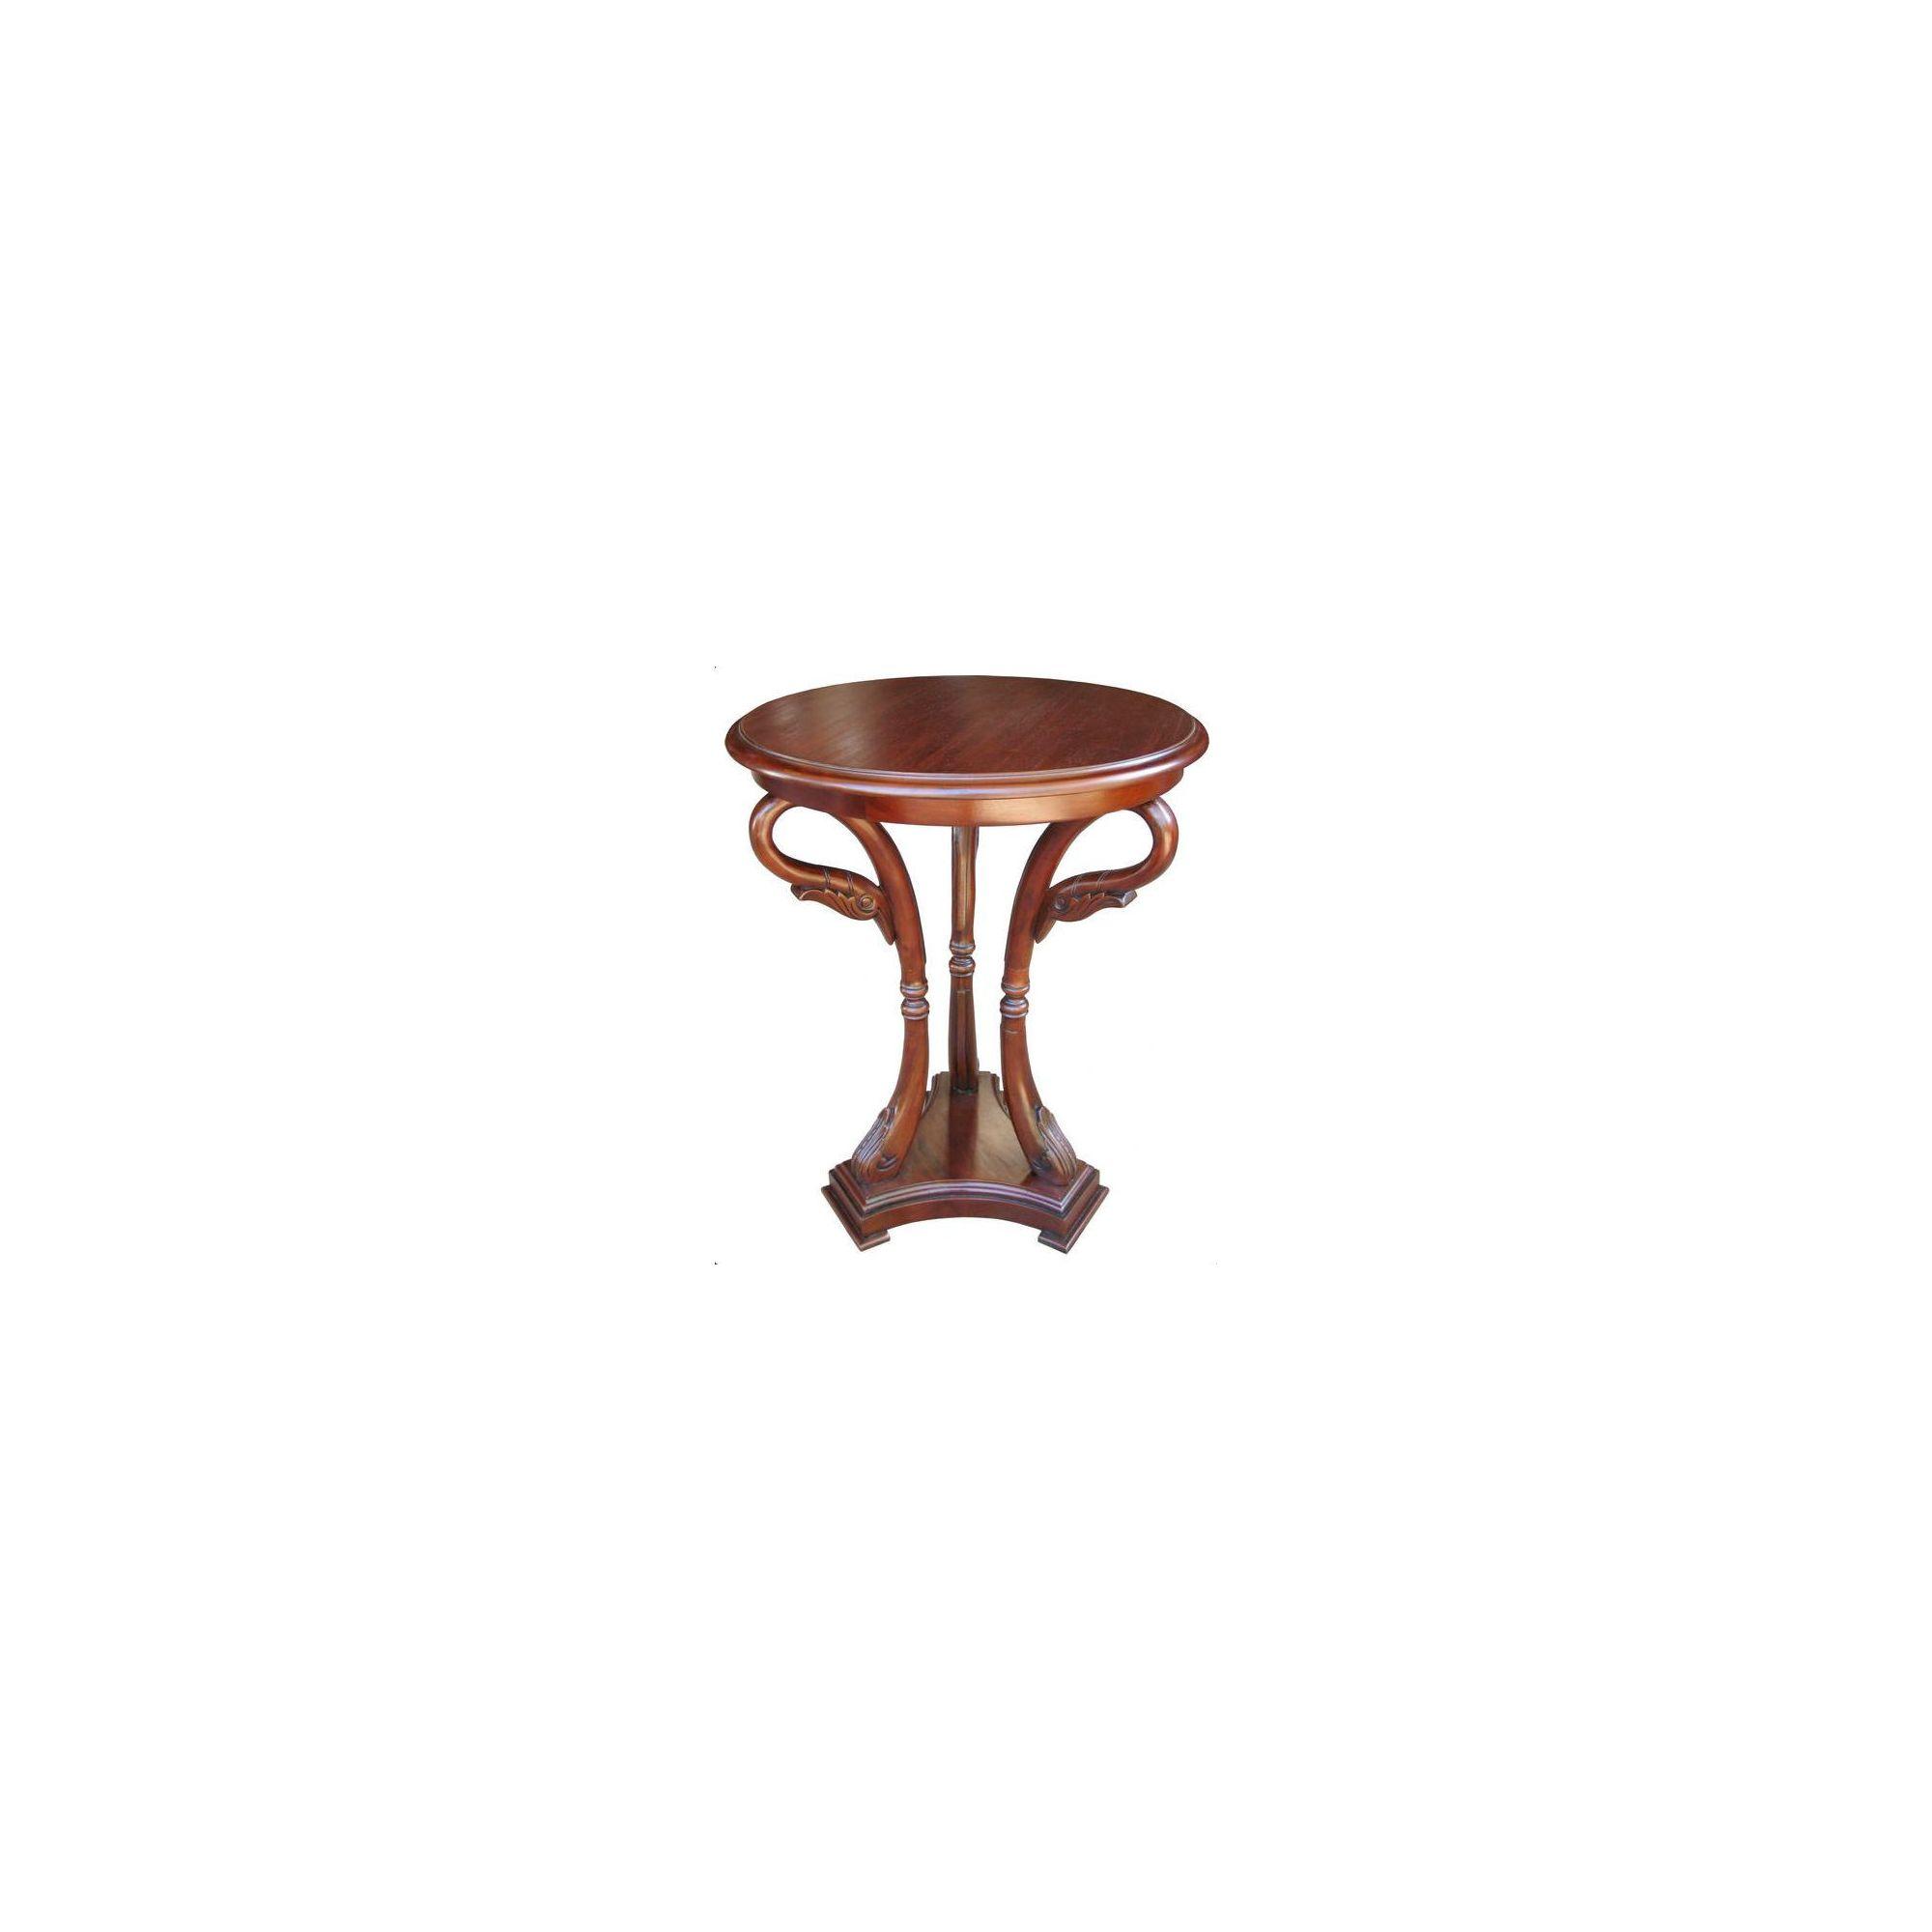 Lock stock and barrel Mahogany Swan Carved Side Table in Mahogany at Tesco Direct